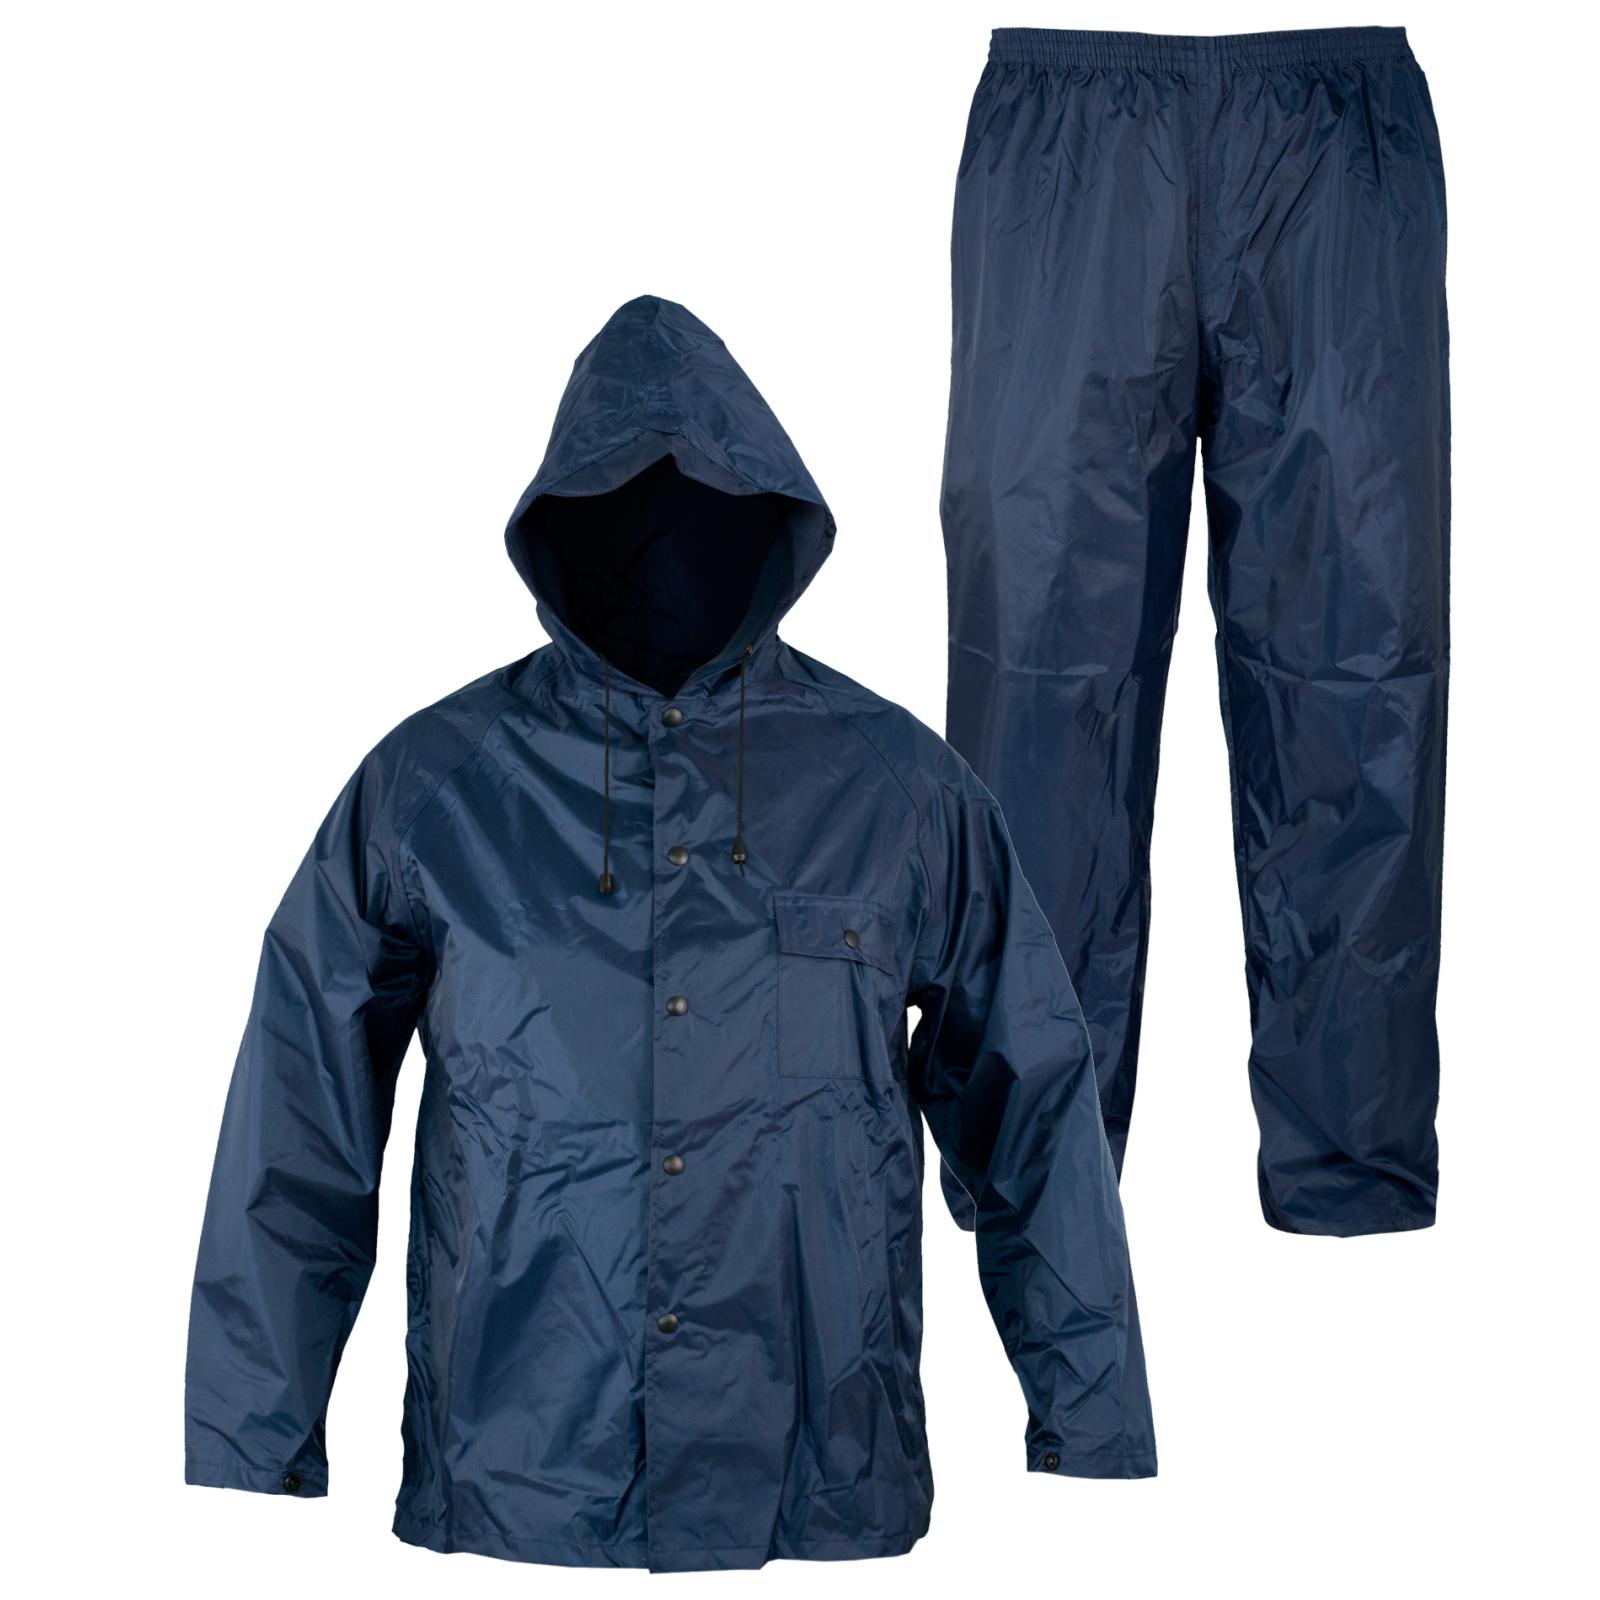 Rainsuit Impermeable Pantalon Chaqueta hombres señoras Capucha Traje lluvia  Azul  93d82793e08